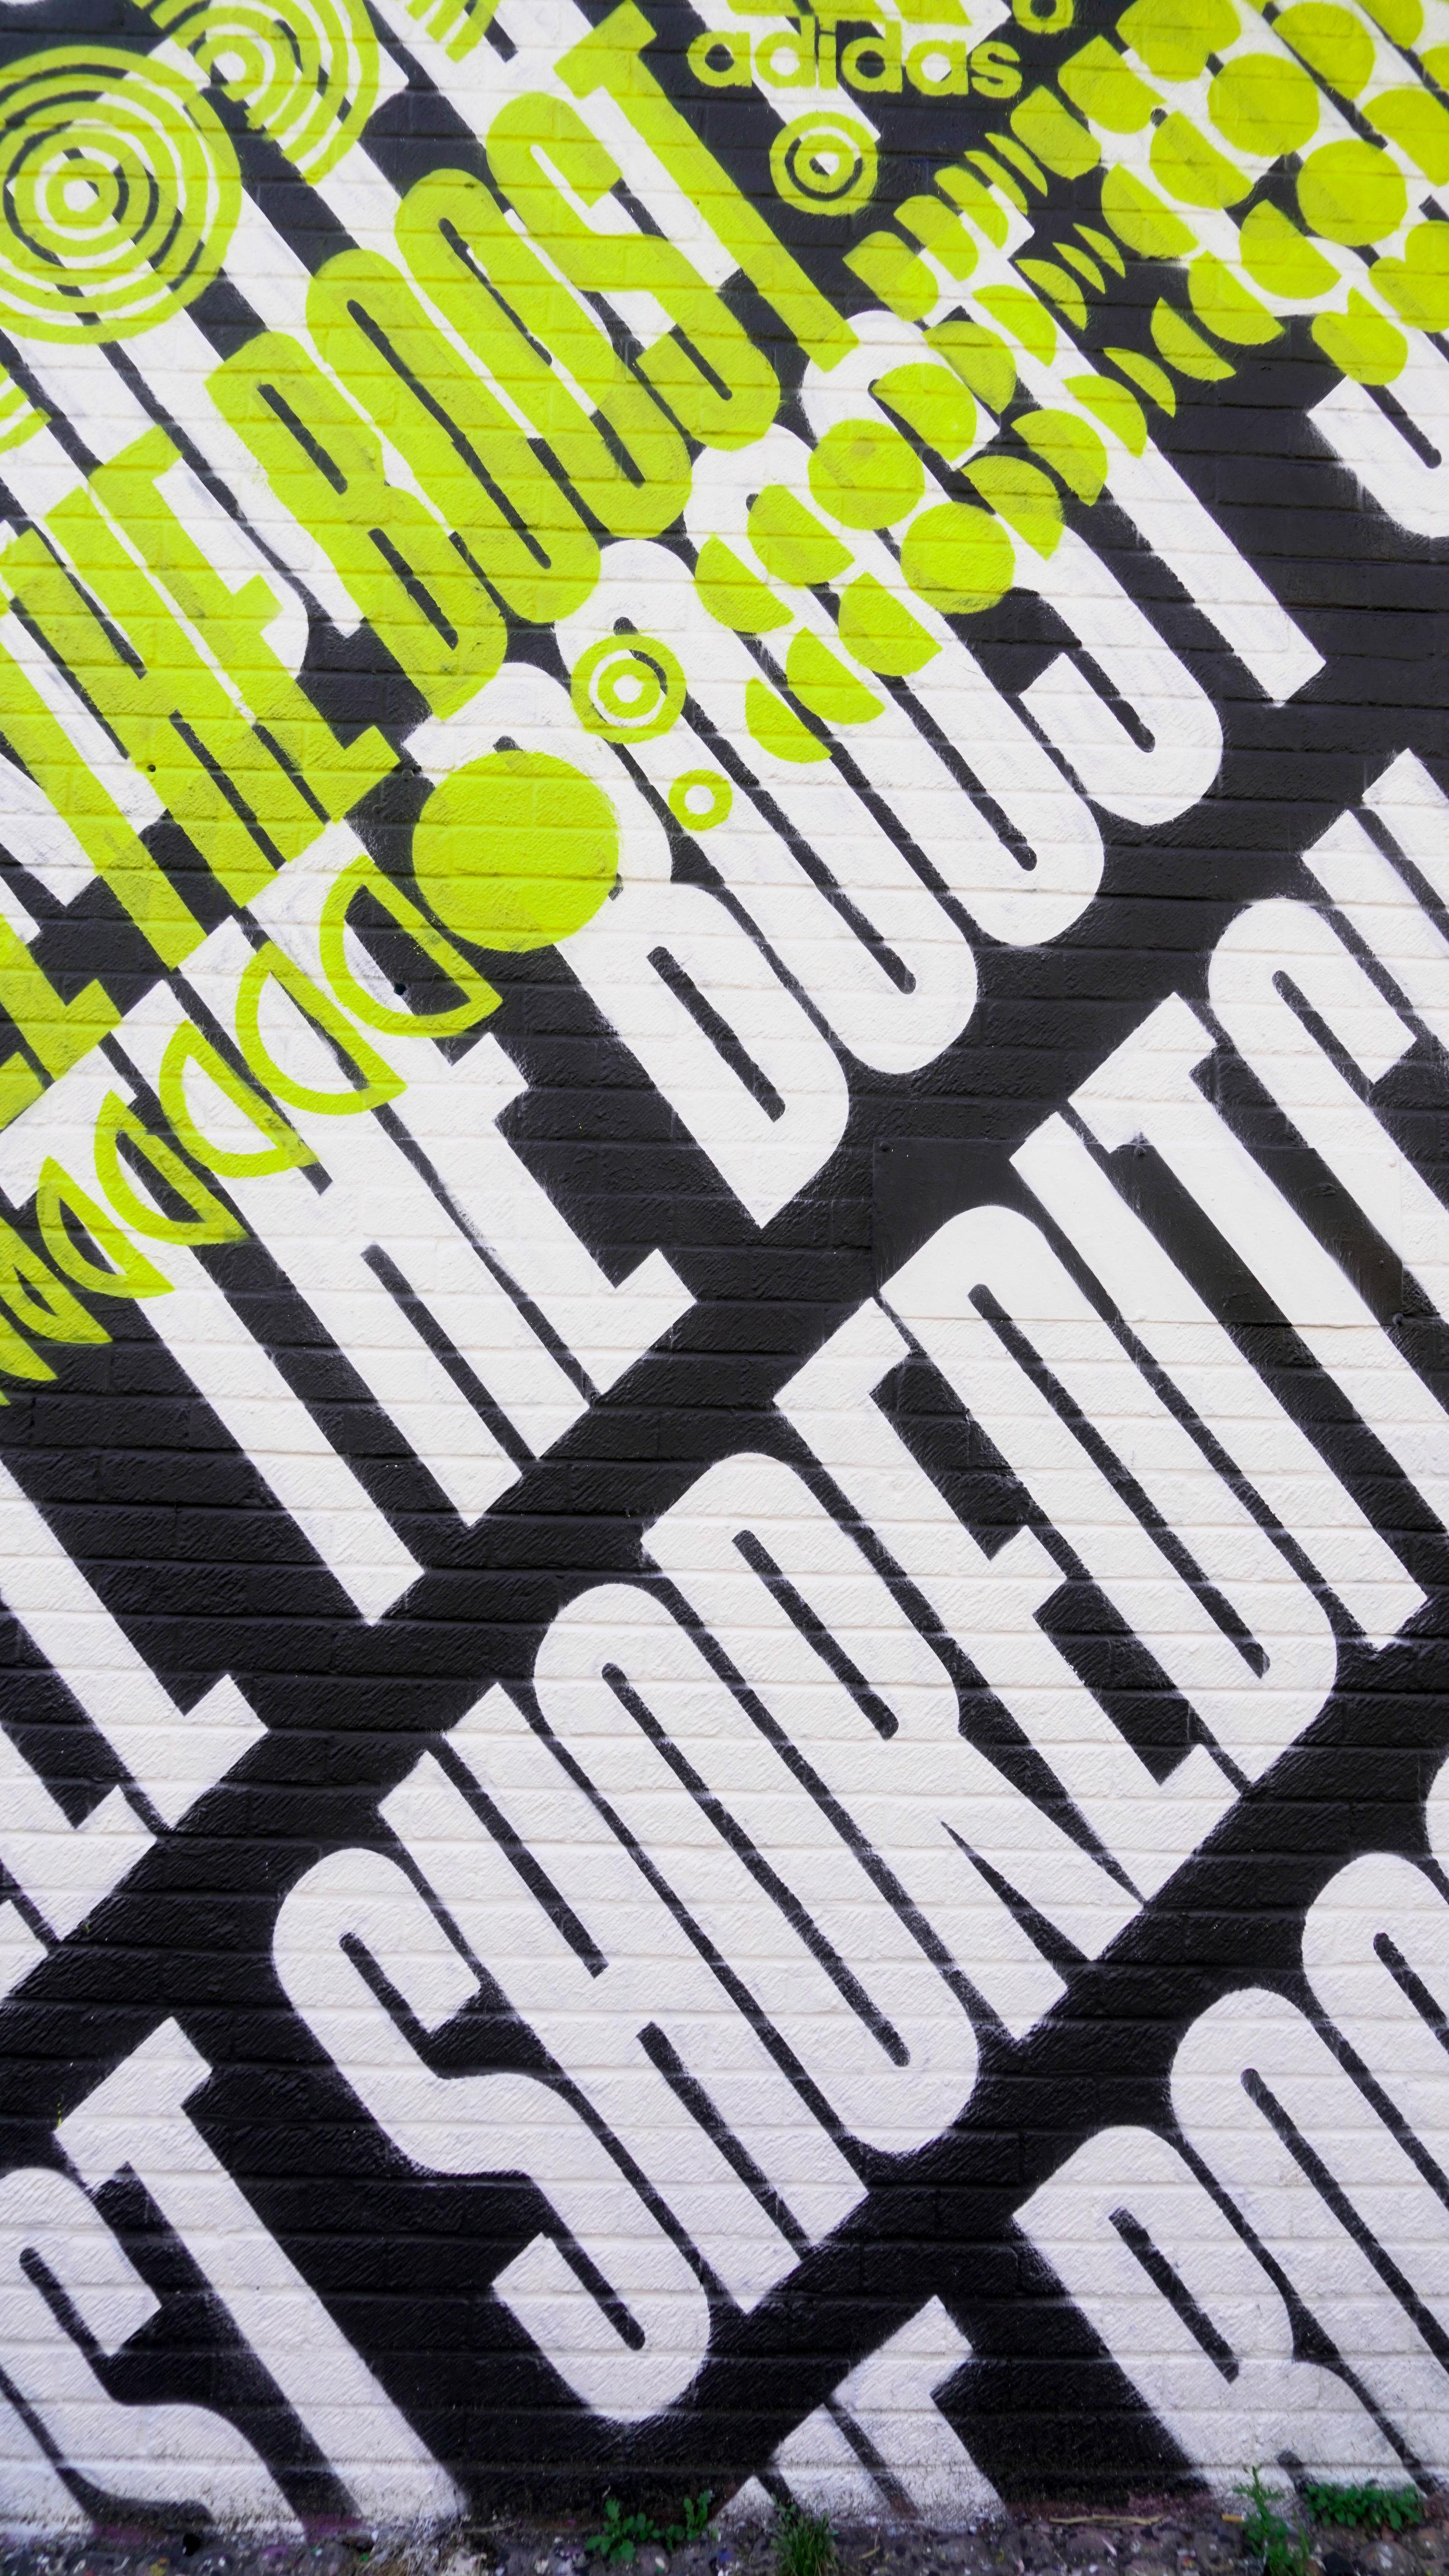 Adidas ultra boost - Highrise -28.jpg